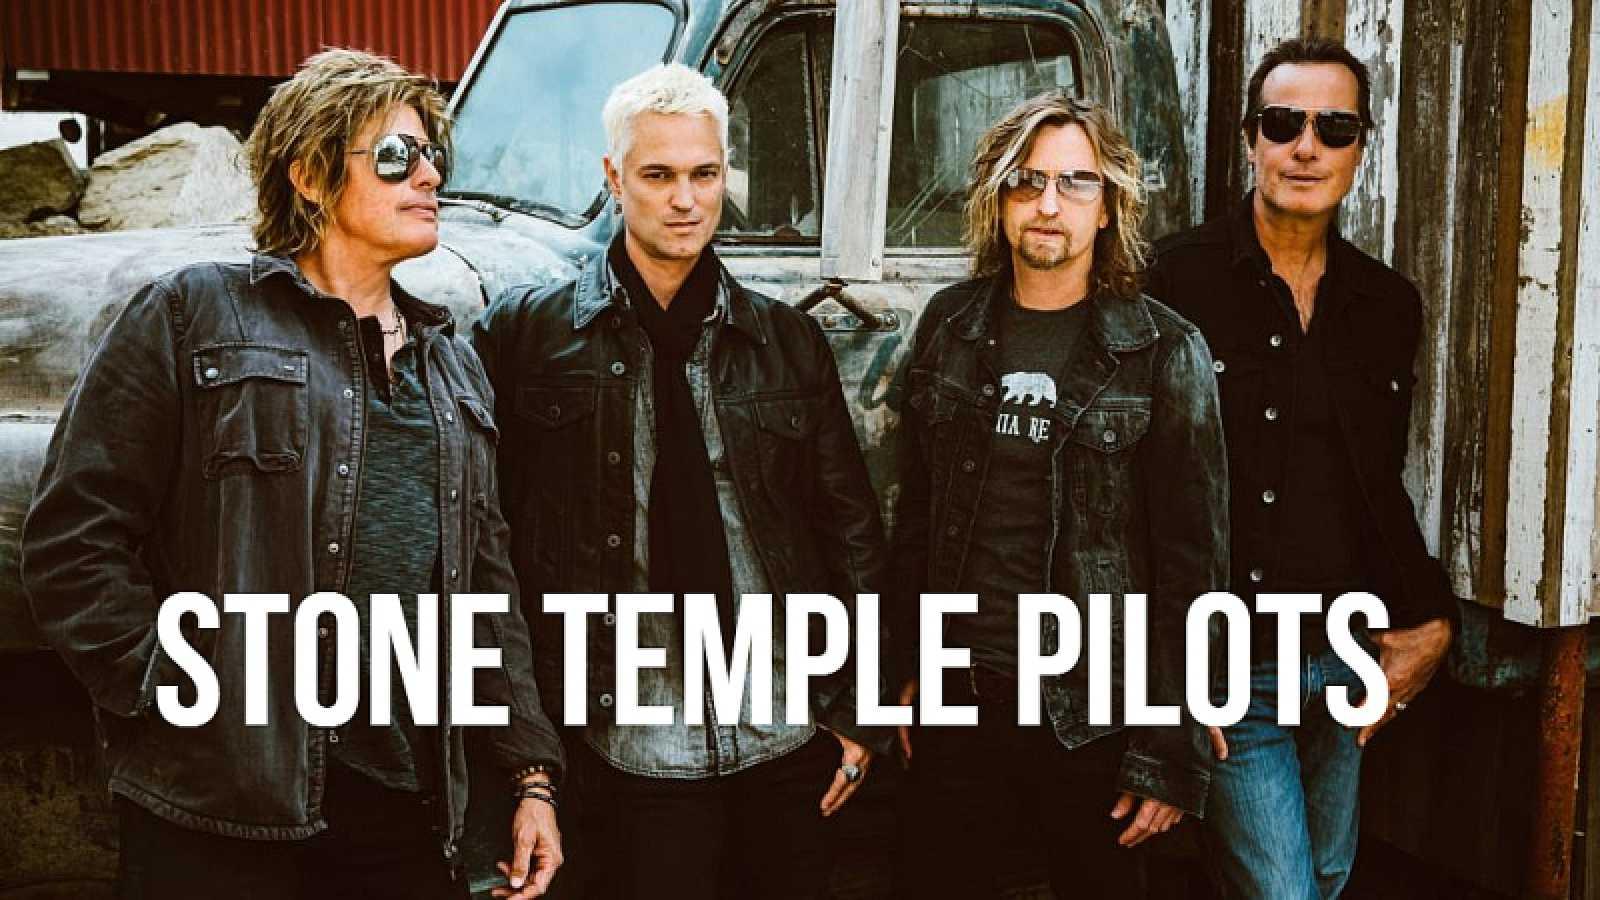 Próxima parada - Stone Temple Pilots &  Jethro Tull y Aztec Camera - 20/10/20 - escuchar ahora